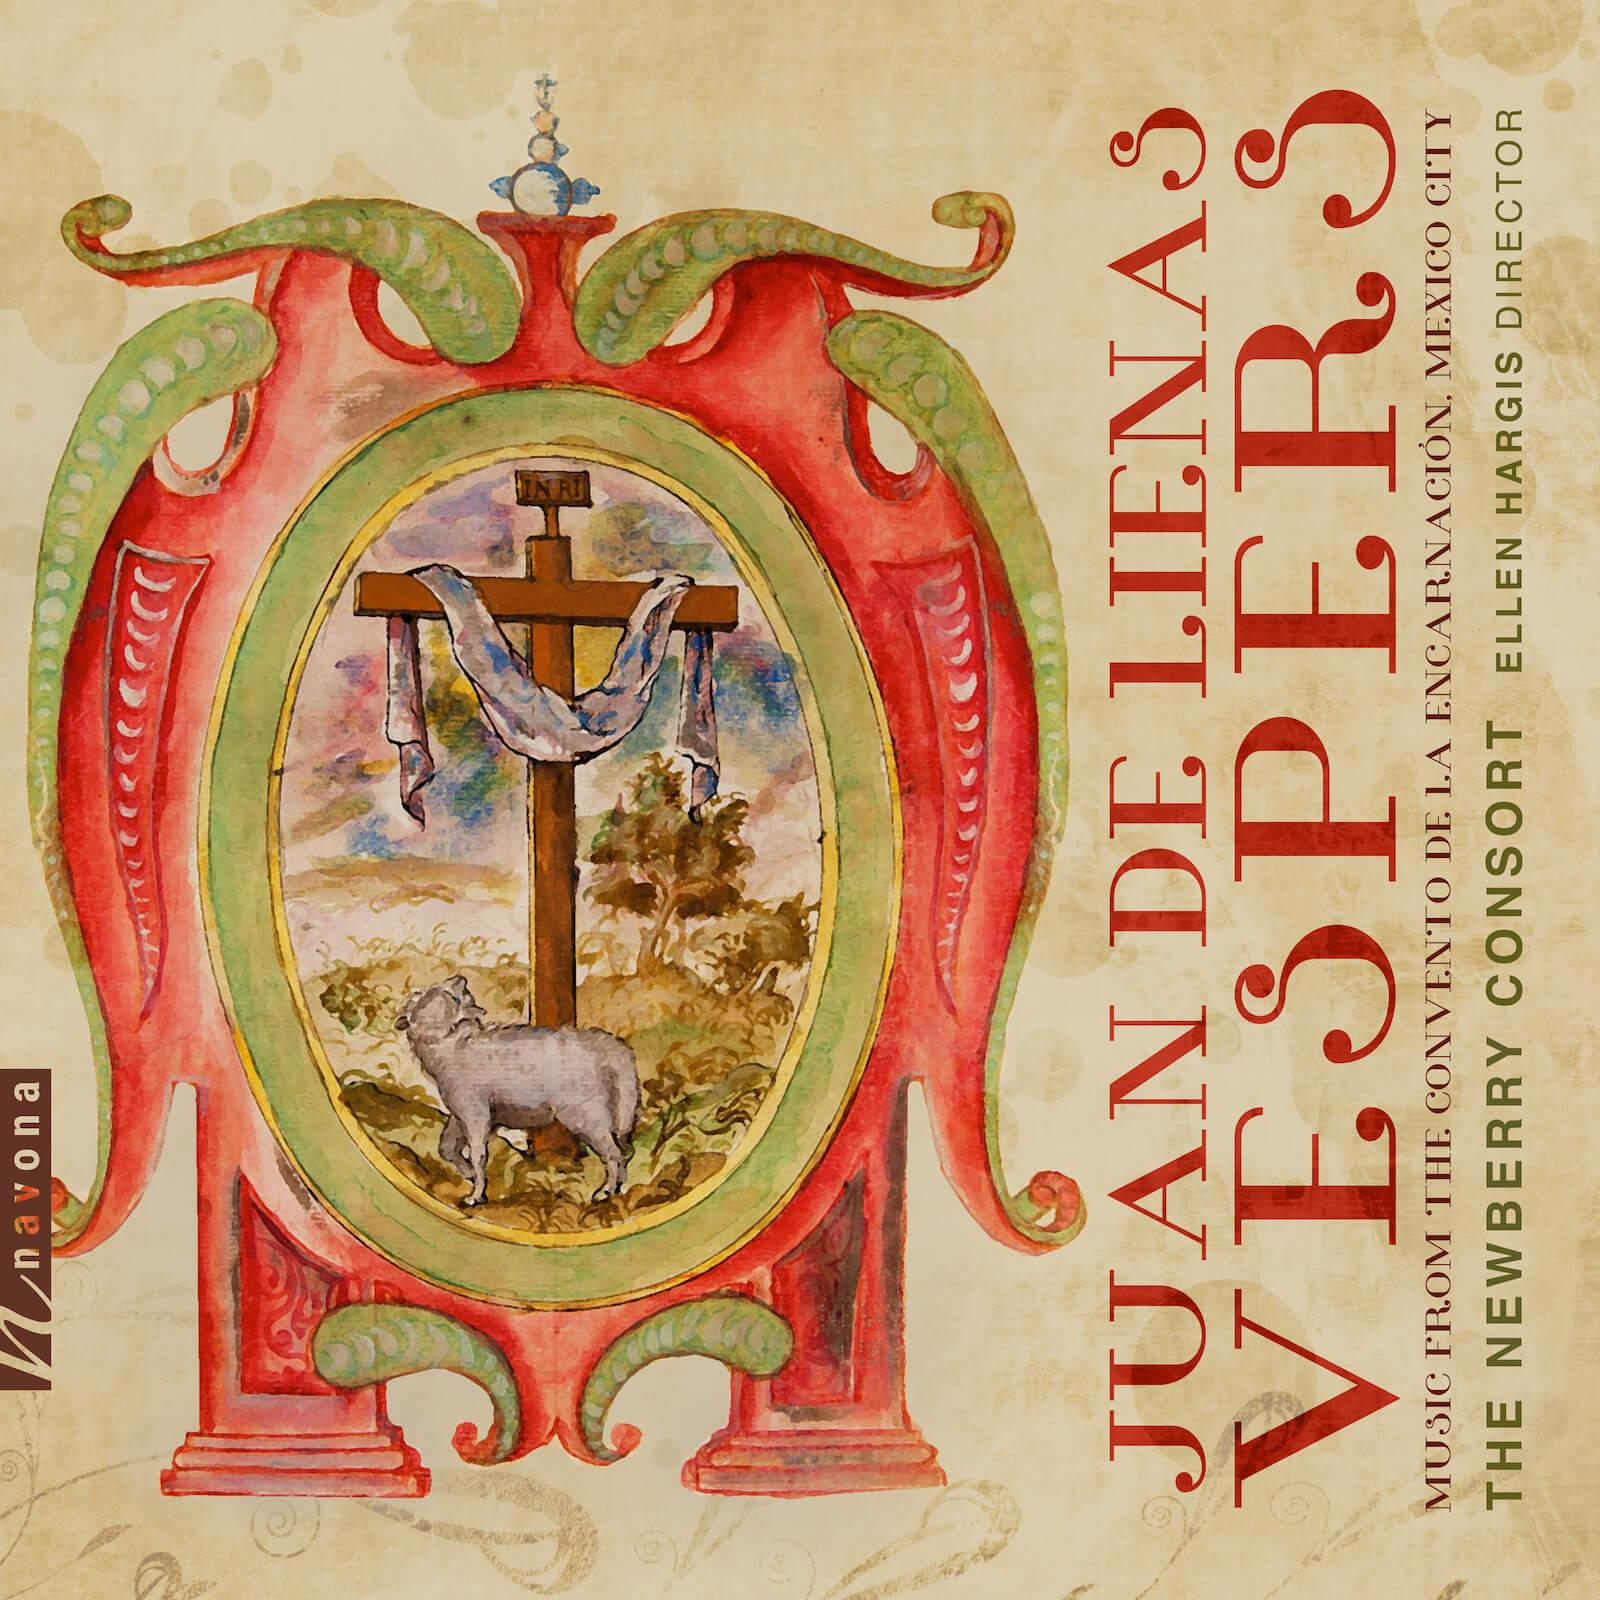 JUAN DE LIENAS: VESPERS - album cover